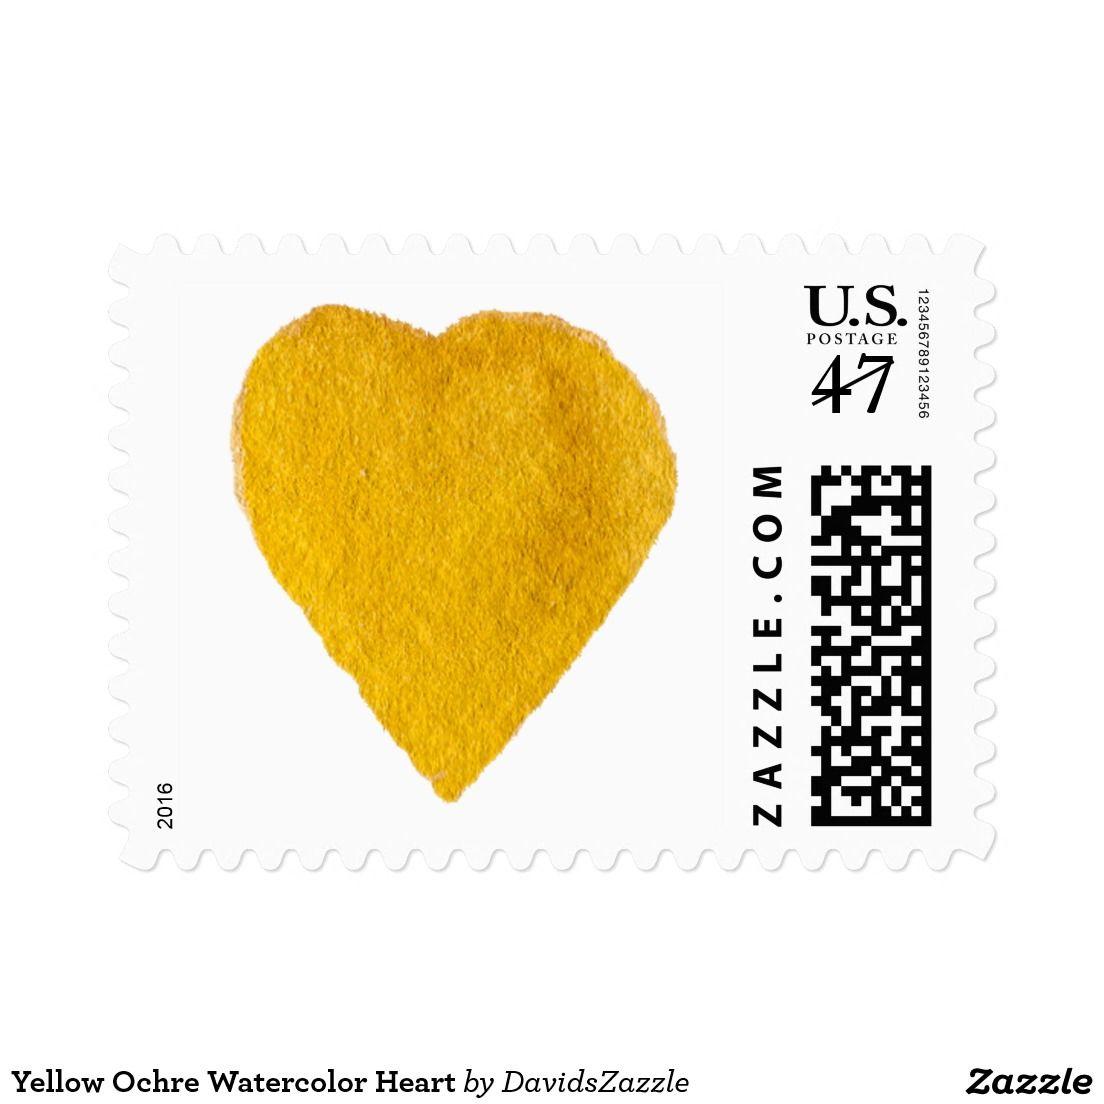 Yellow Ochre Watercolor Heart Postage  Watercolor Heart